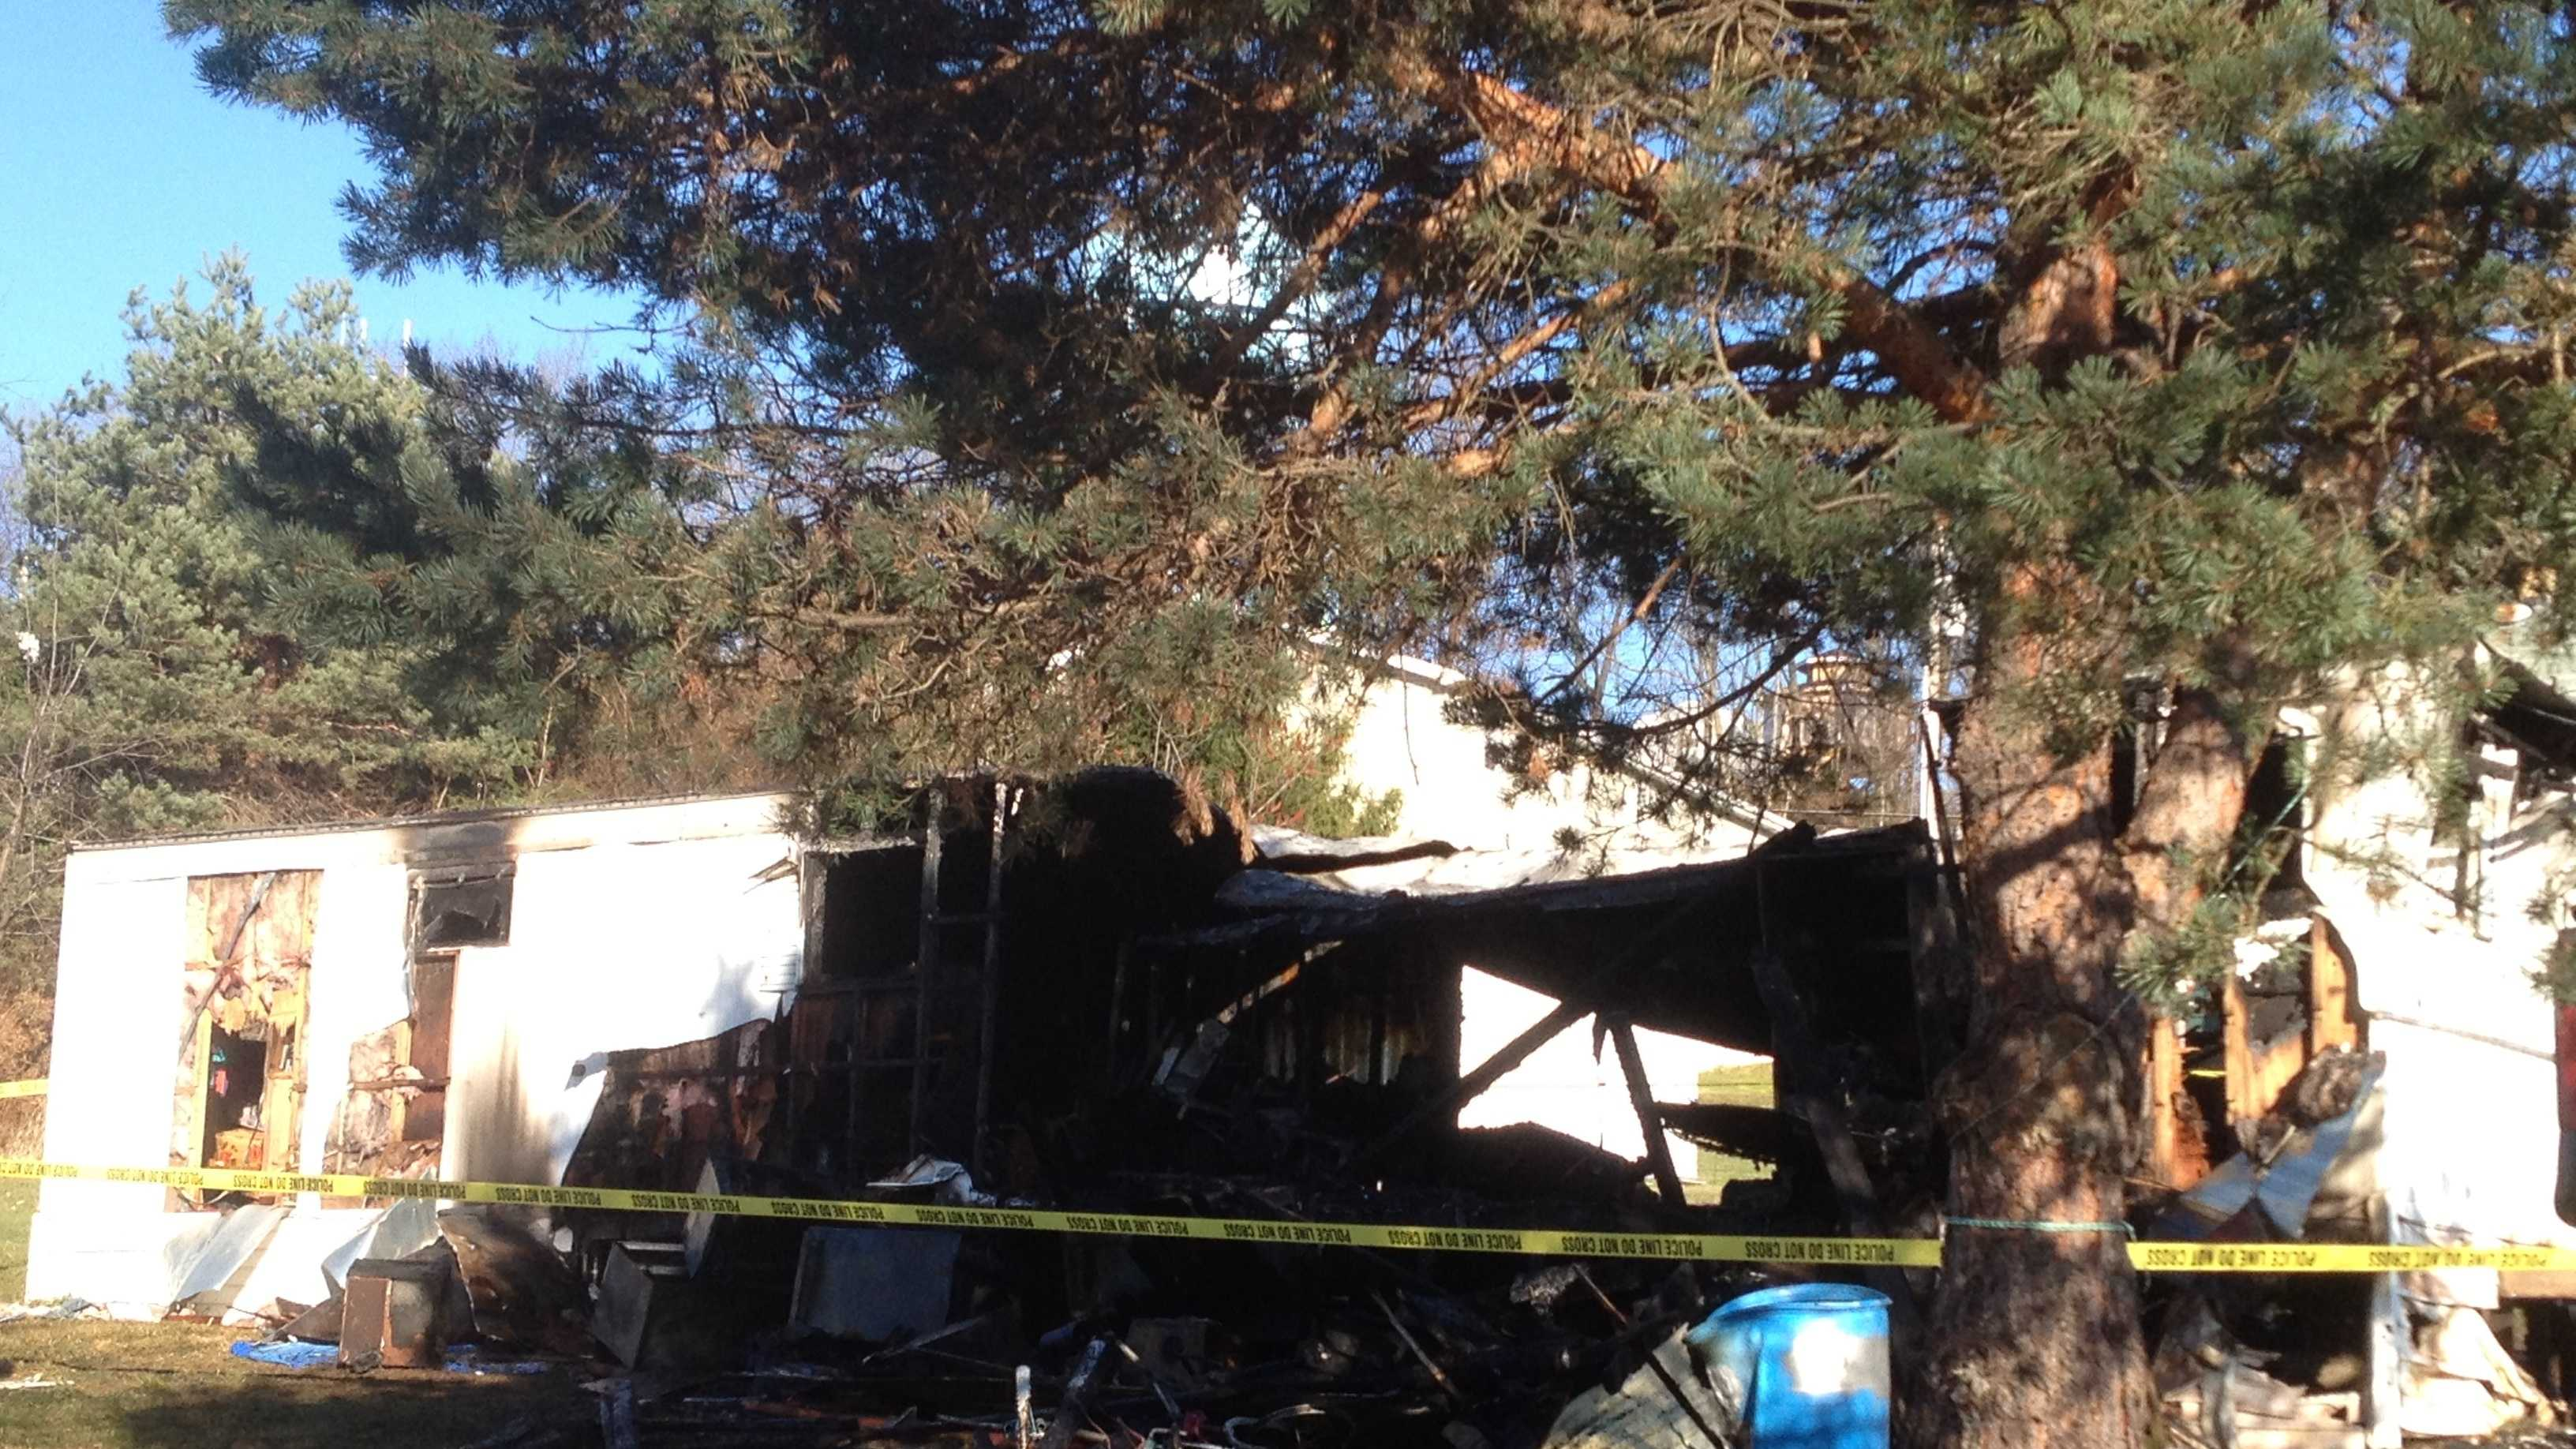 White Township fire